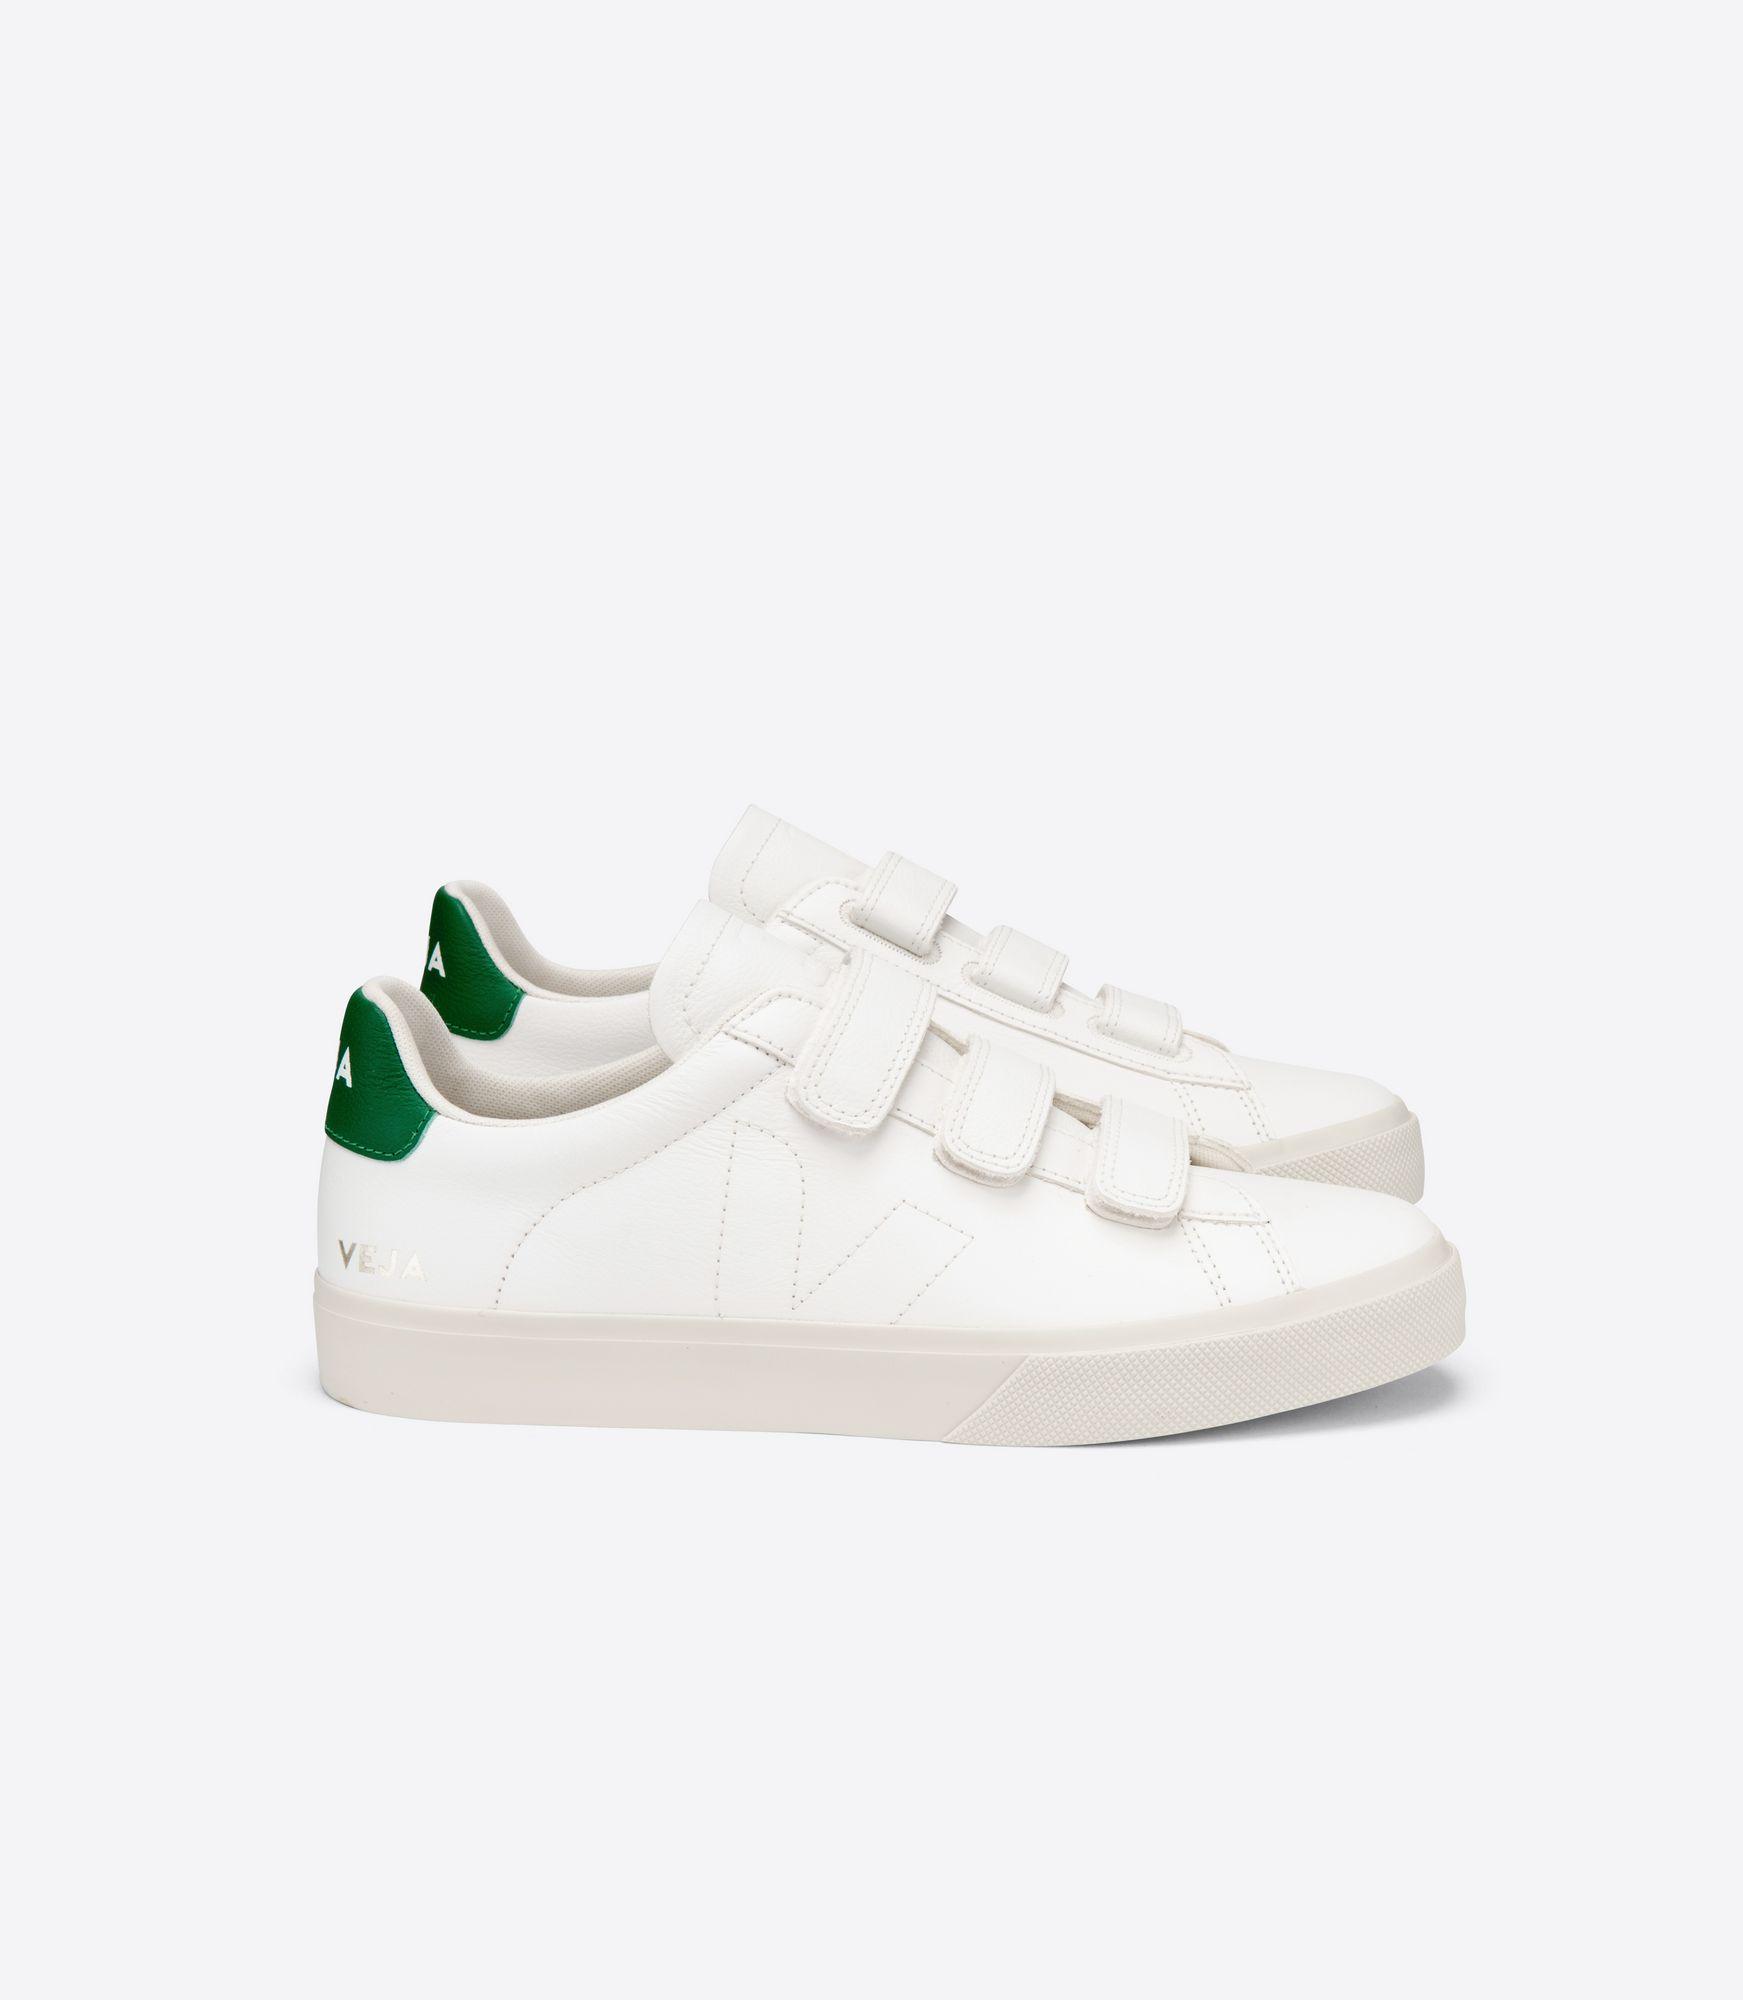 VEJA - Recife - white/emeraude velcro sneaker